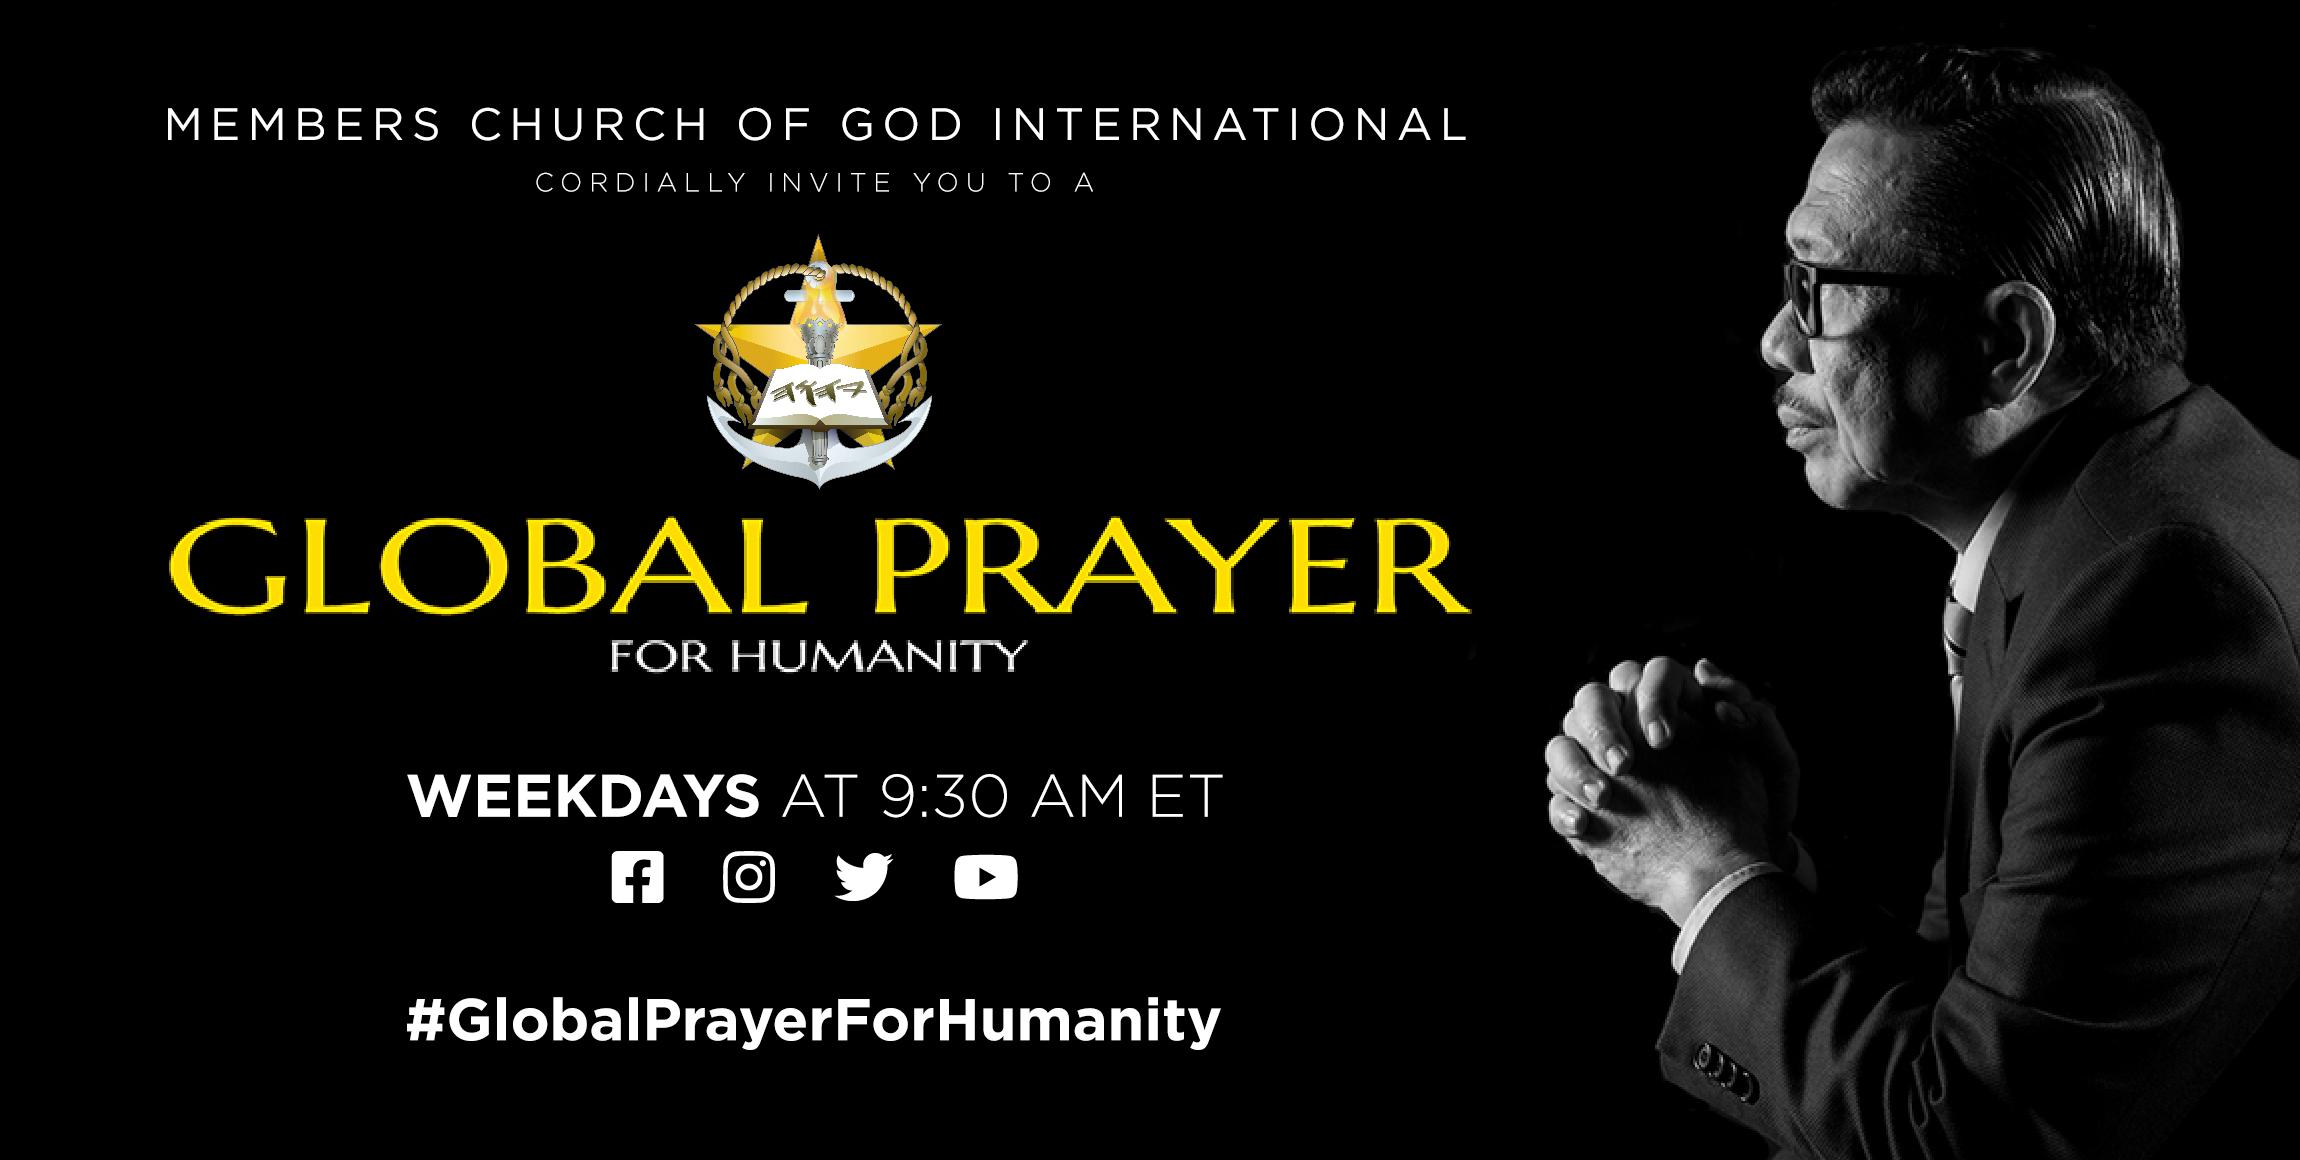 MCGI Global Prayer